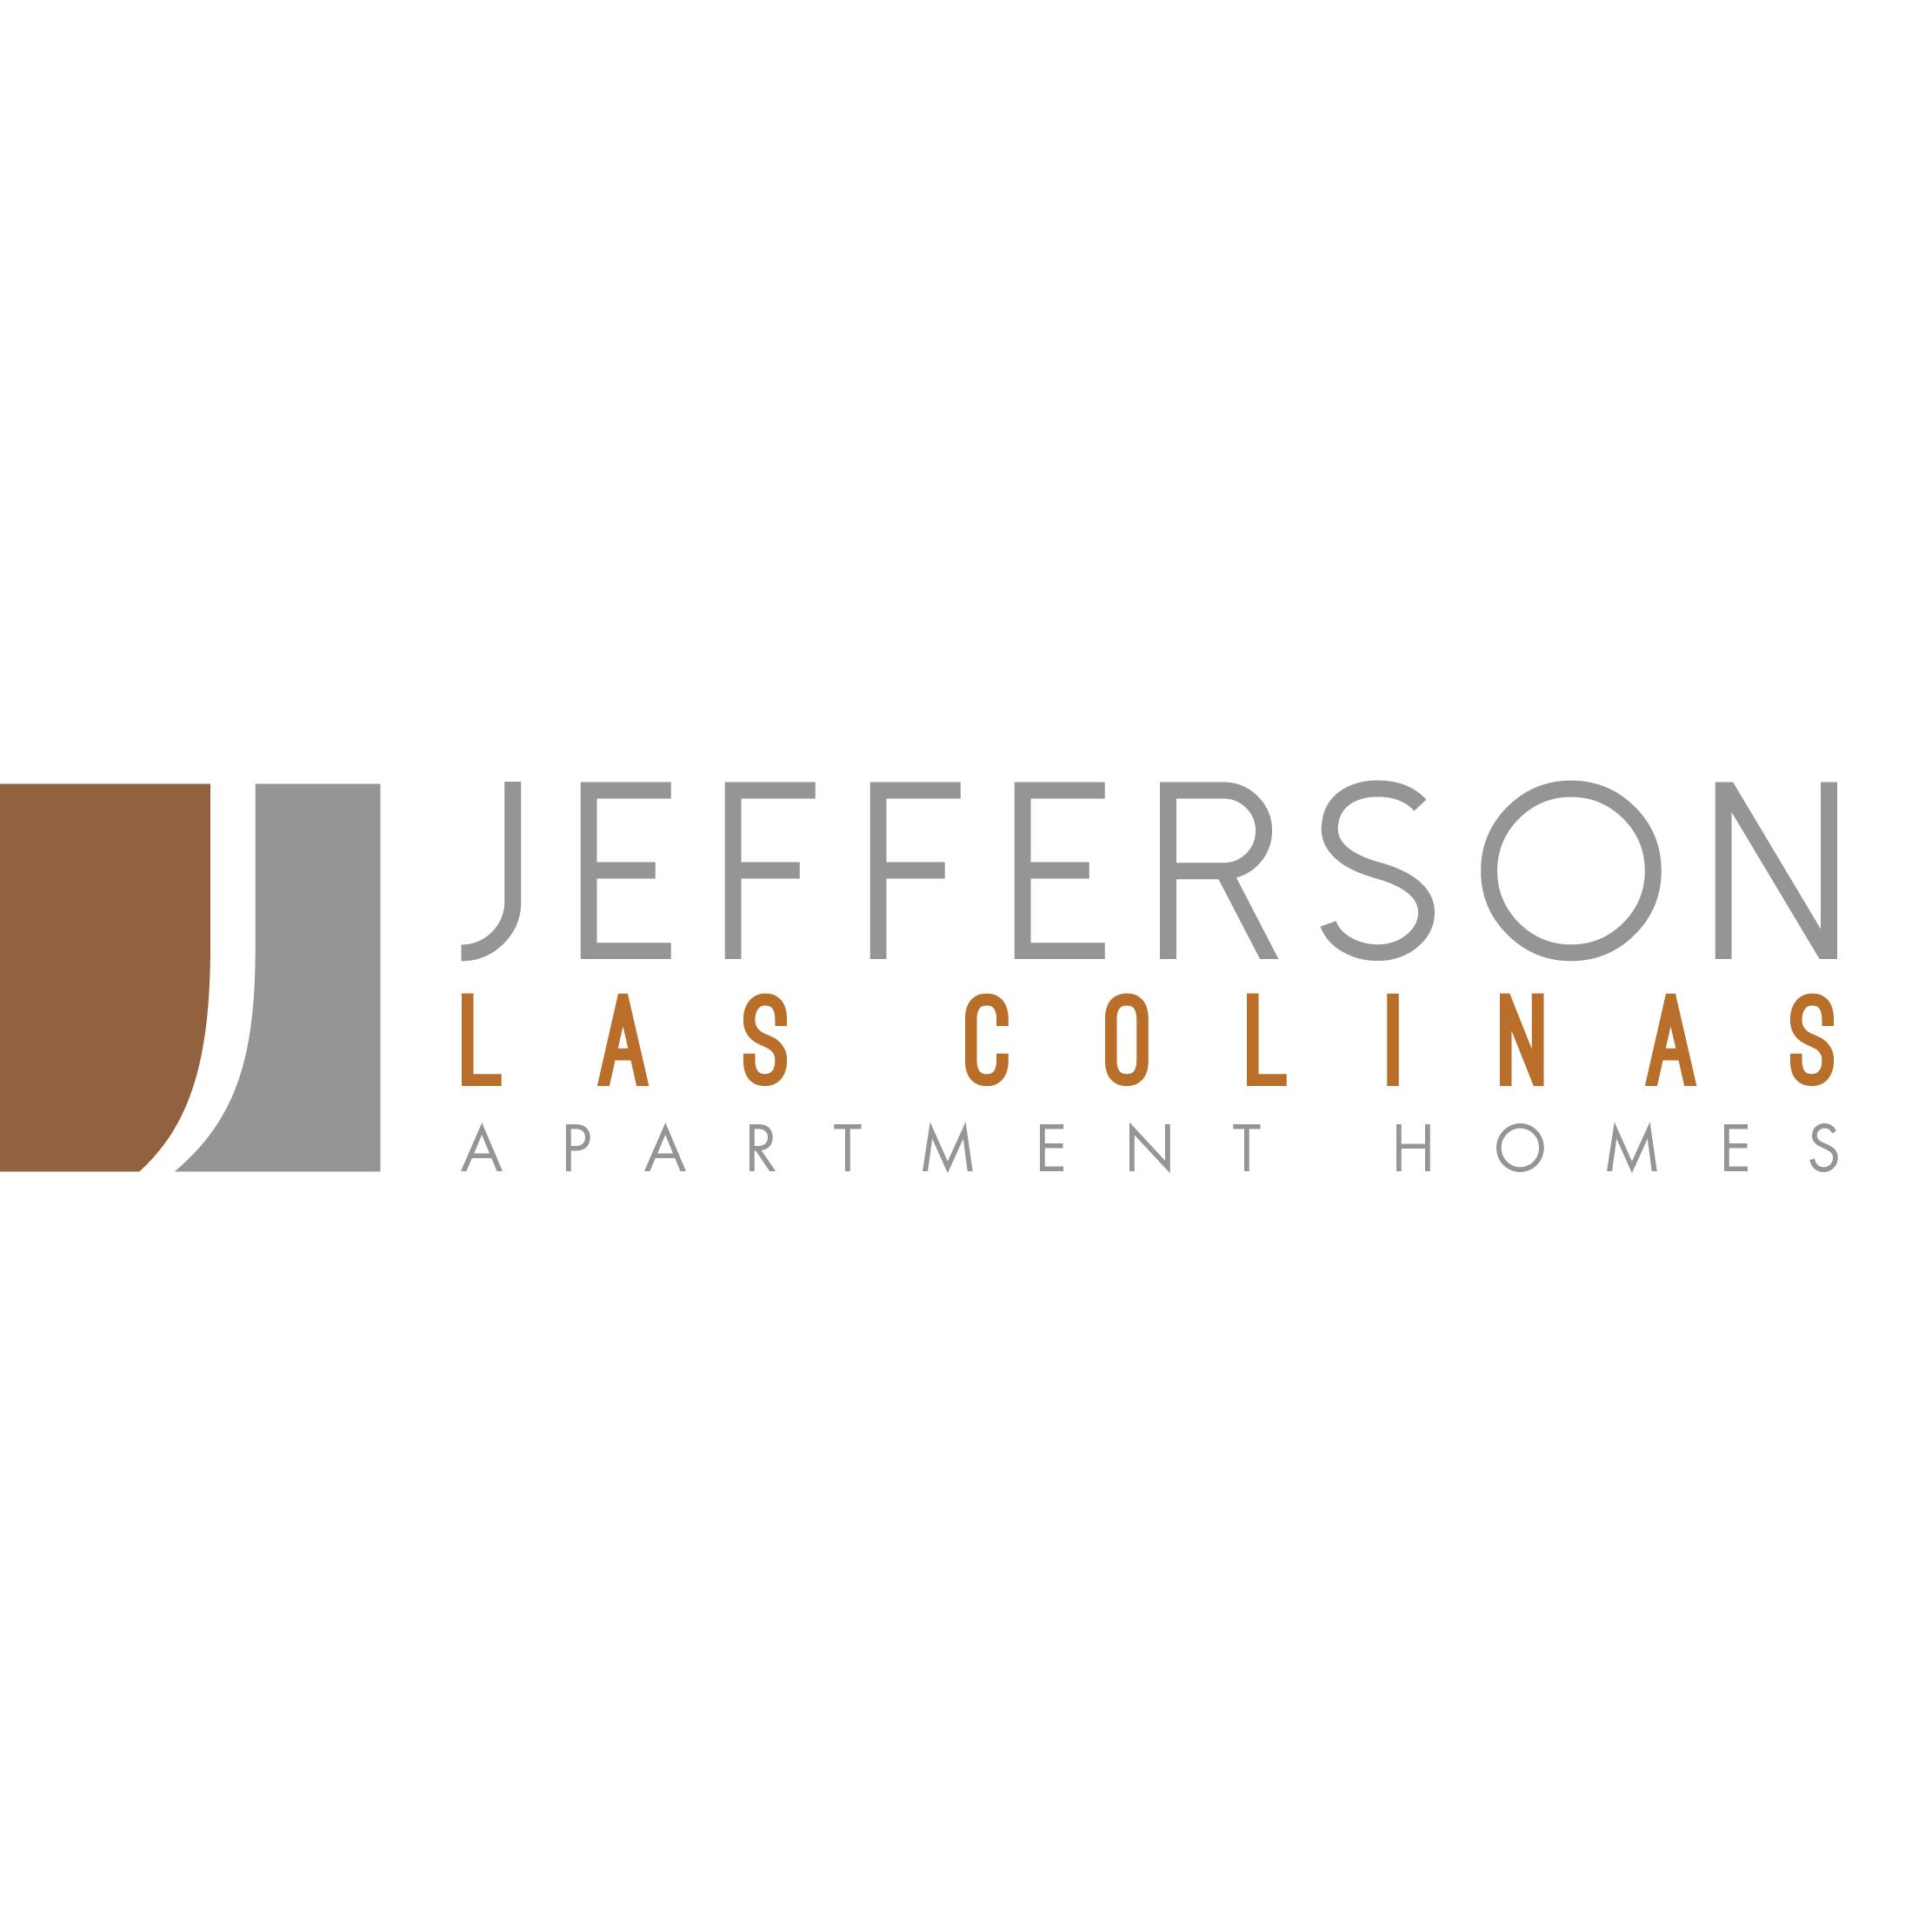 Jefferson Las Colinas Apartments